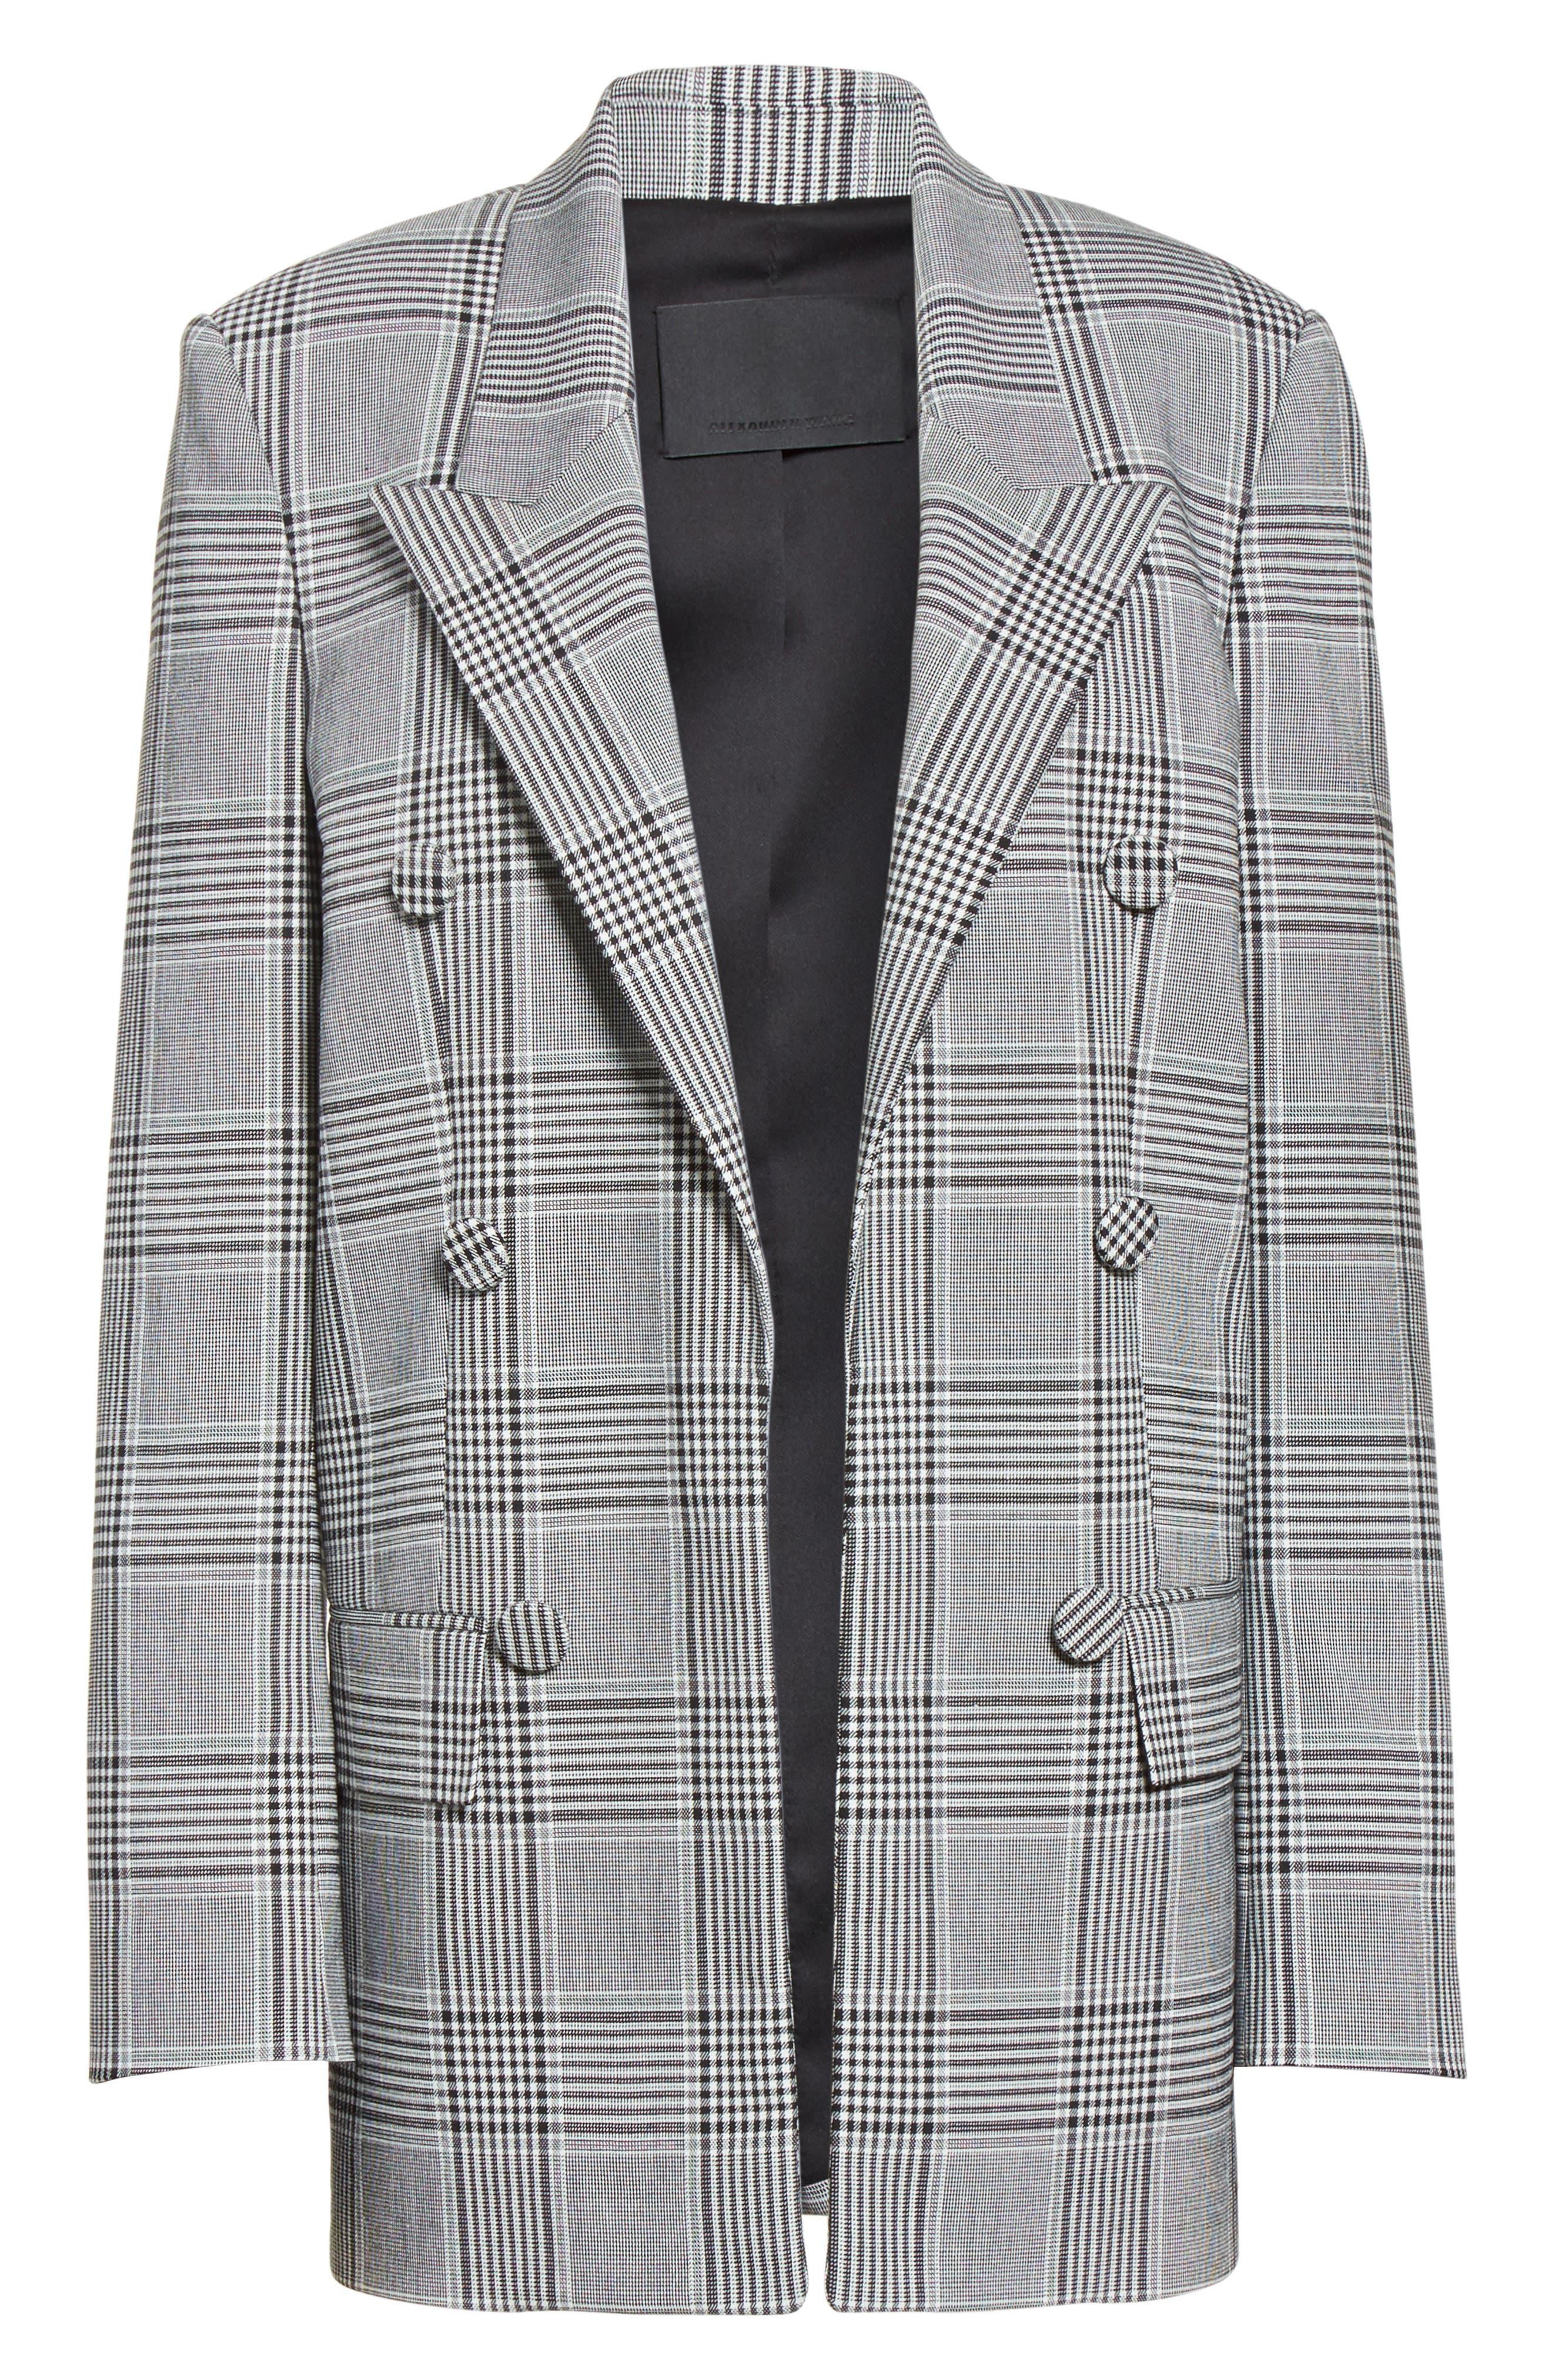 Leather Sleeve Check Blazer,                             Alternate thumbnail 7, color,                             Black/ White